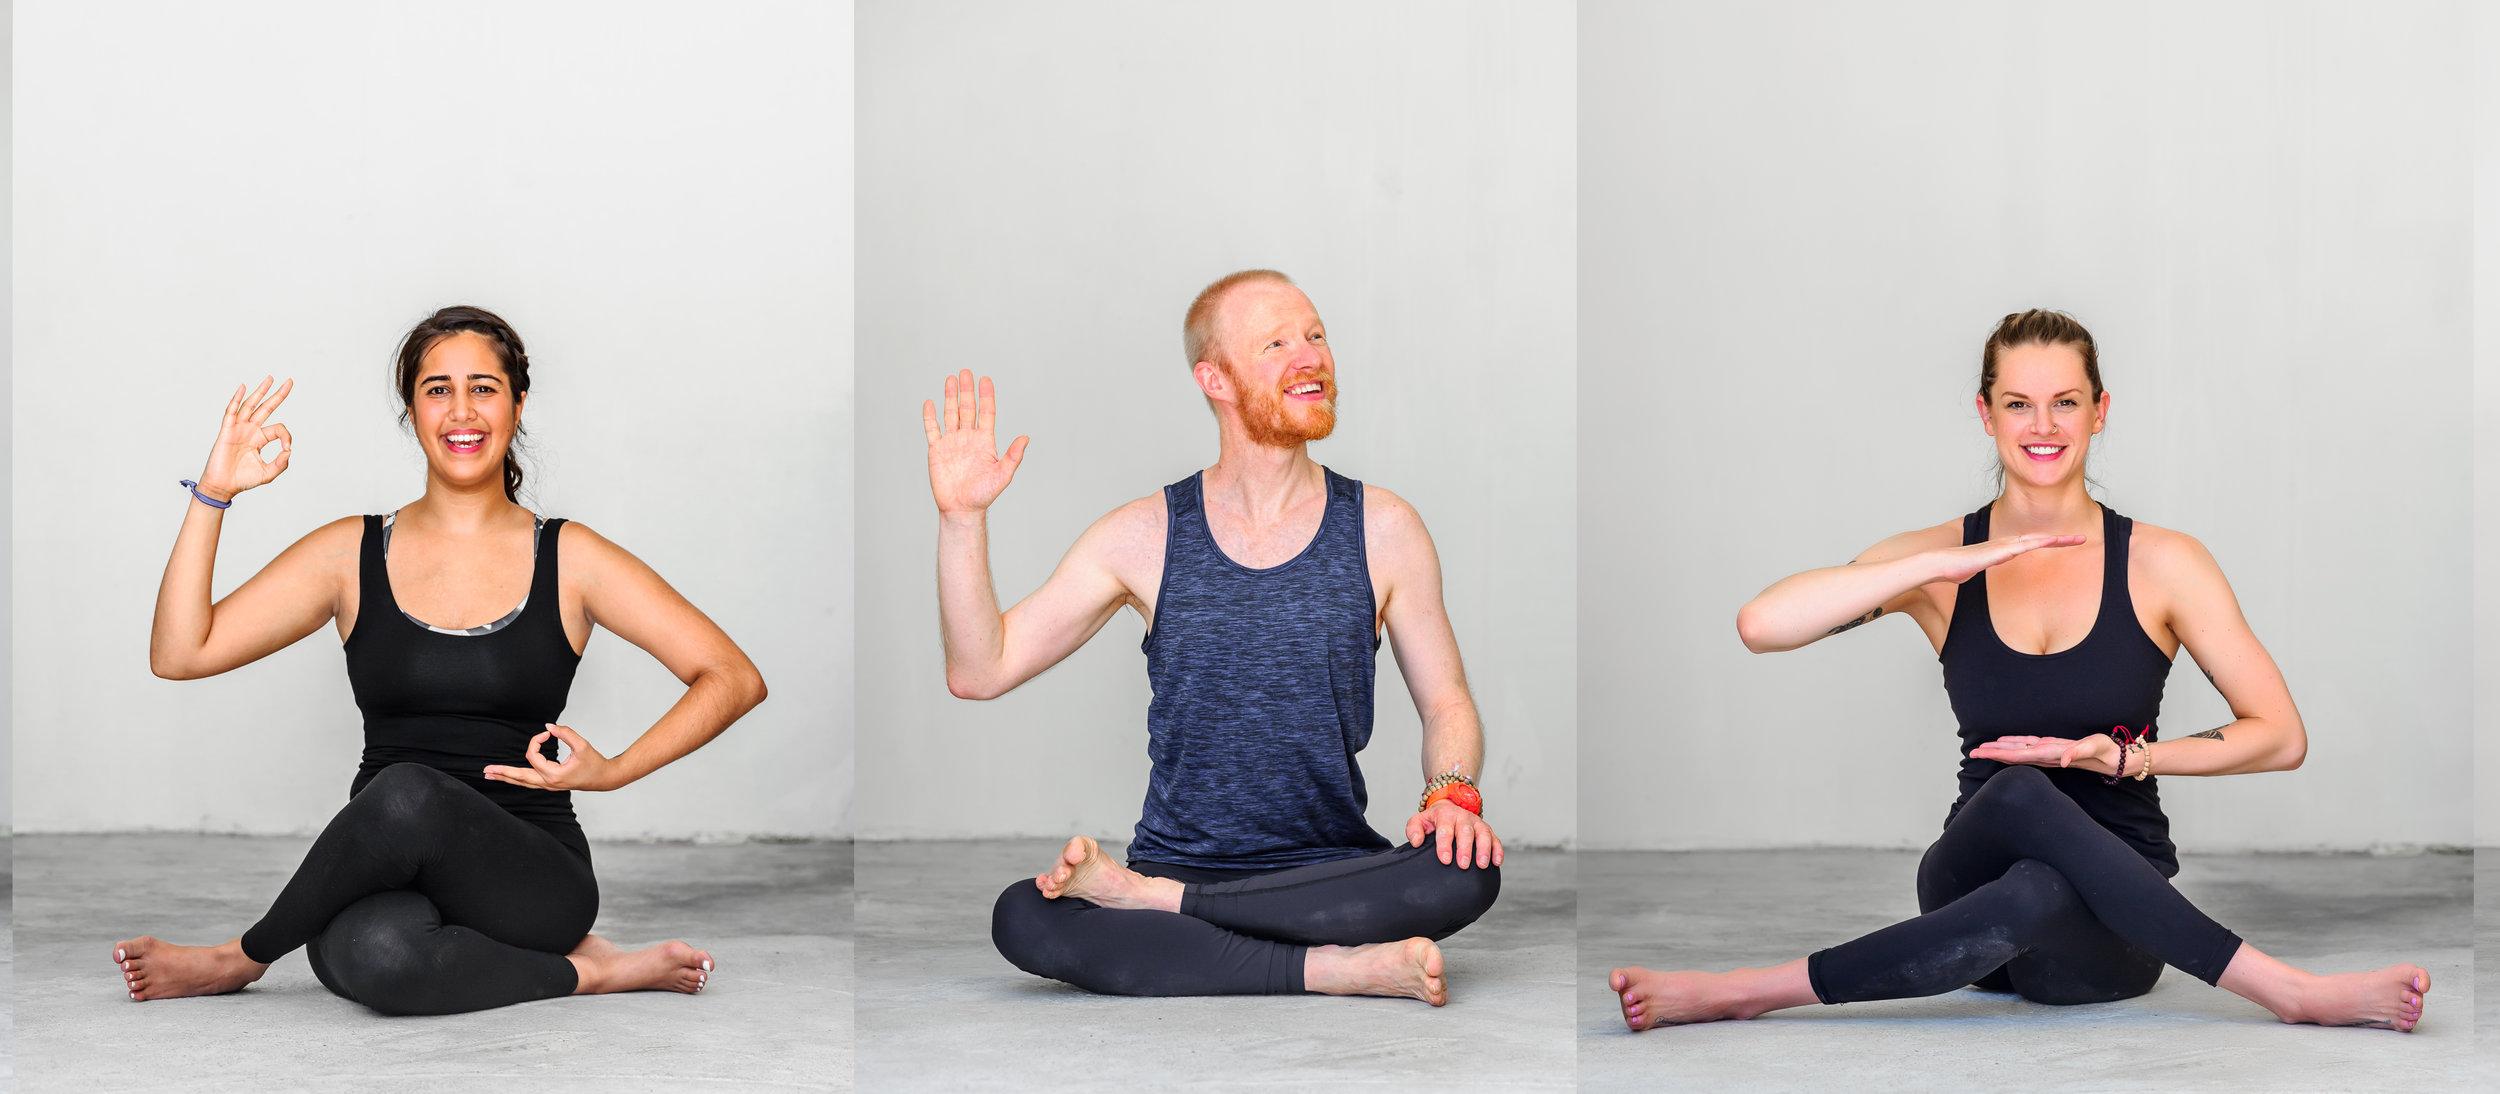 2017-07-18_10-53-16 yoginis.jpg